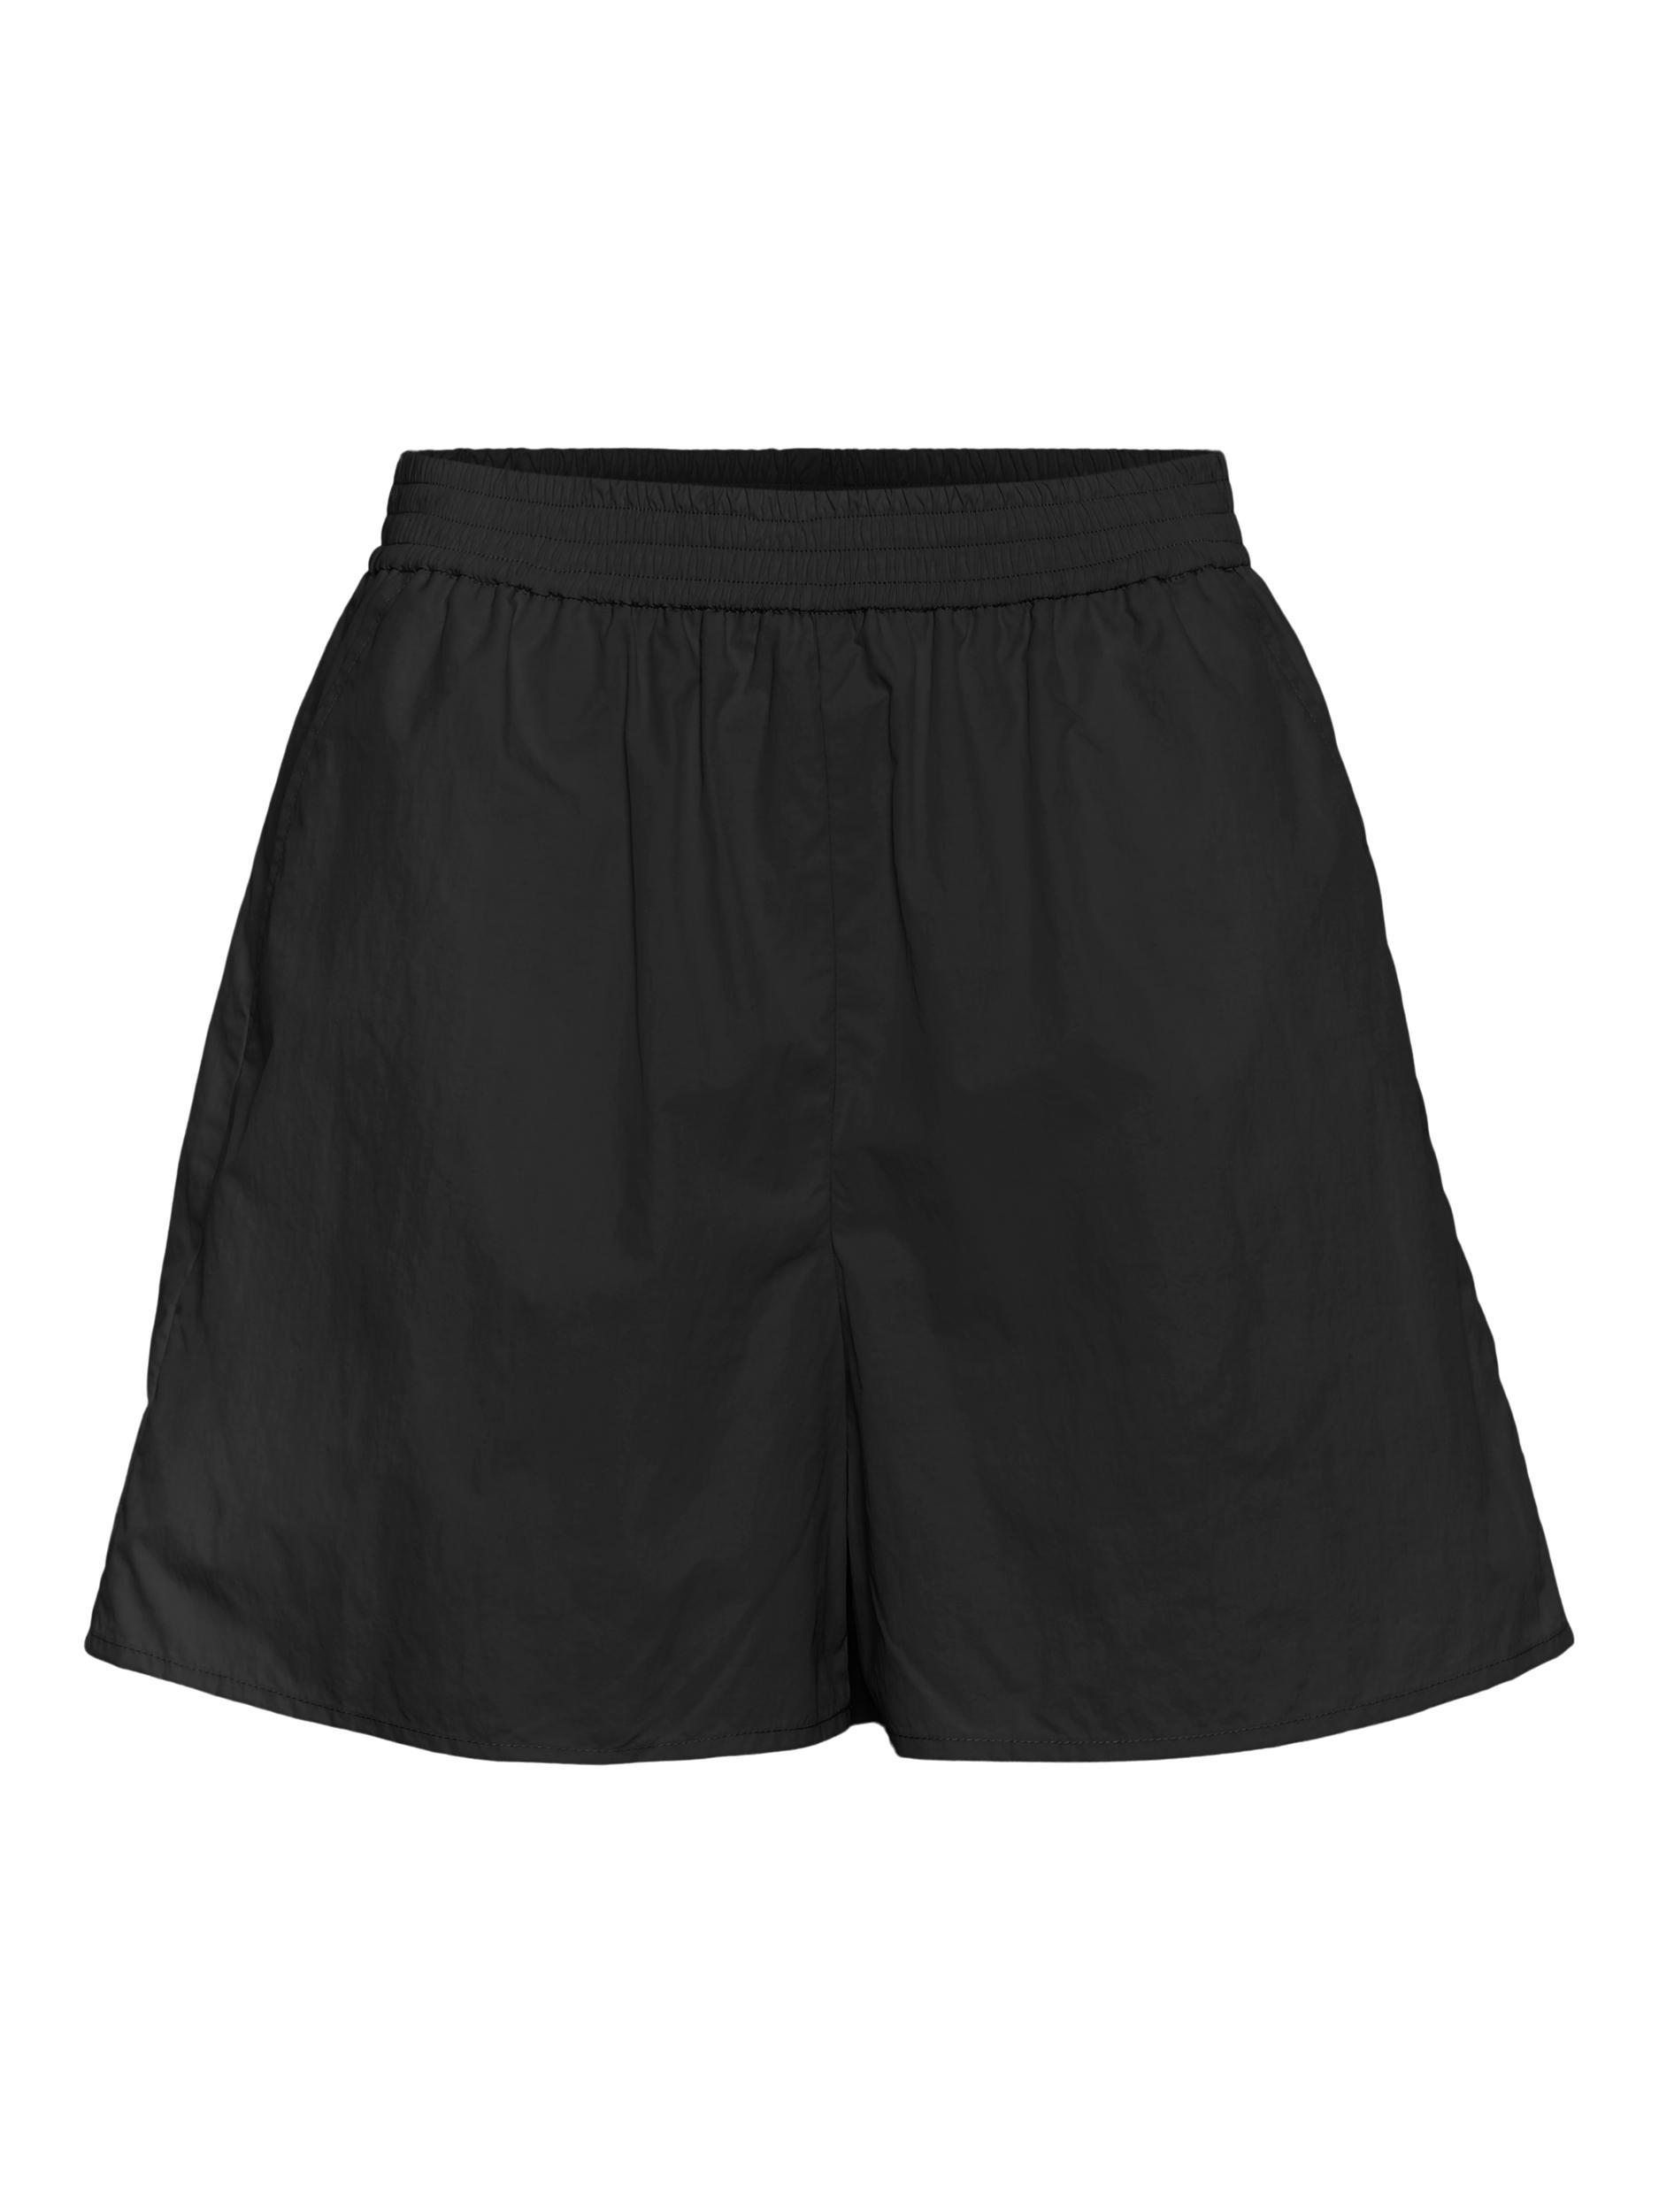 Vero Moda Oislay shorts, black, large